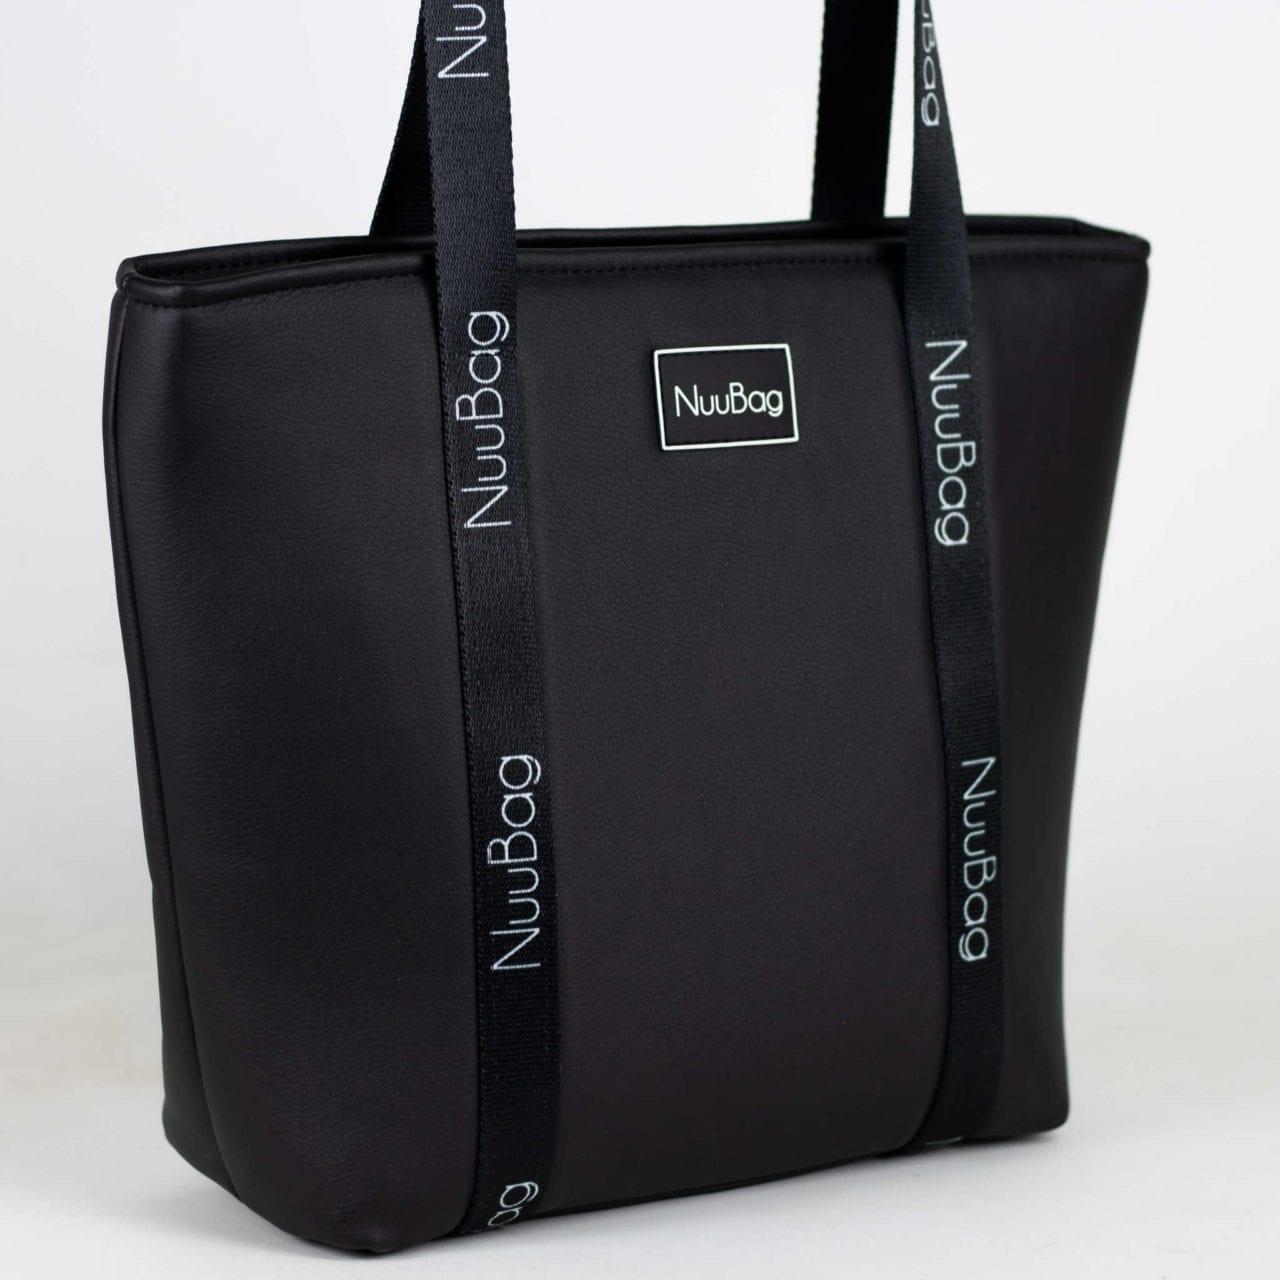 Czarna skorzana torba na zakupy - shopperka